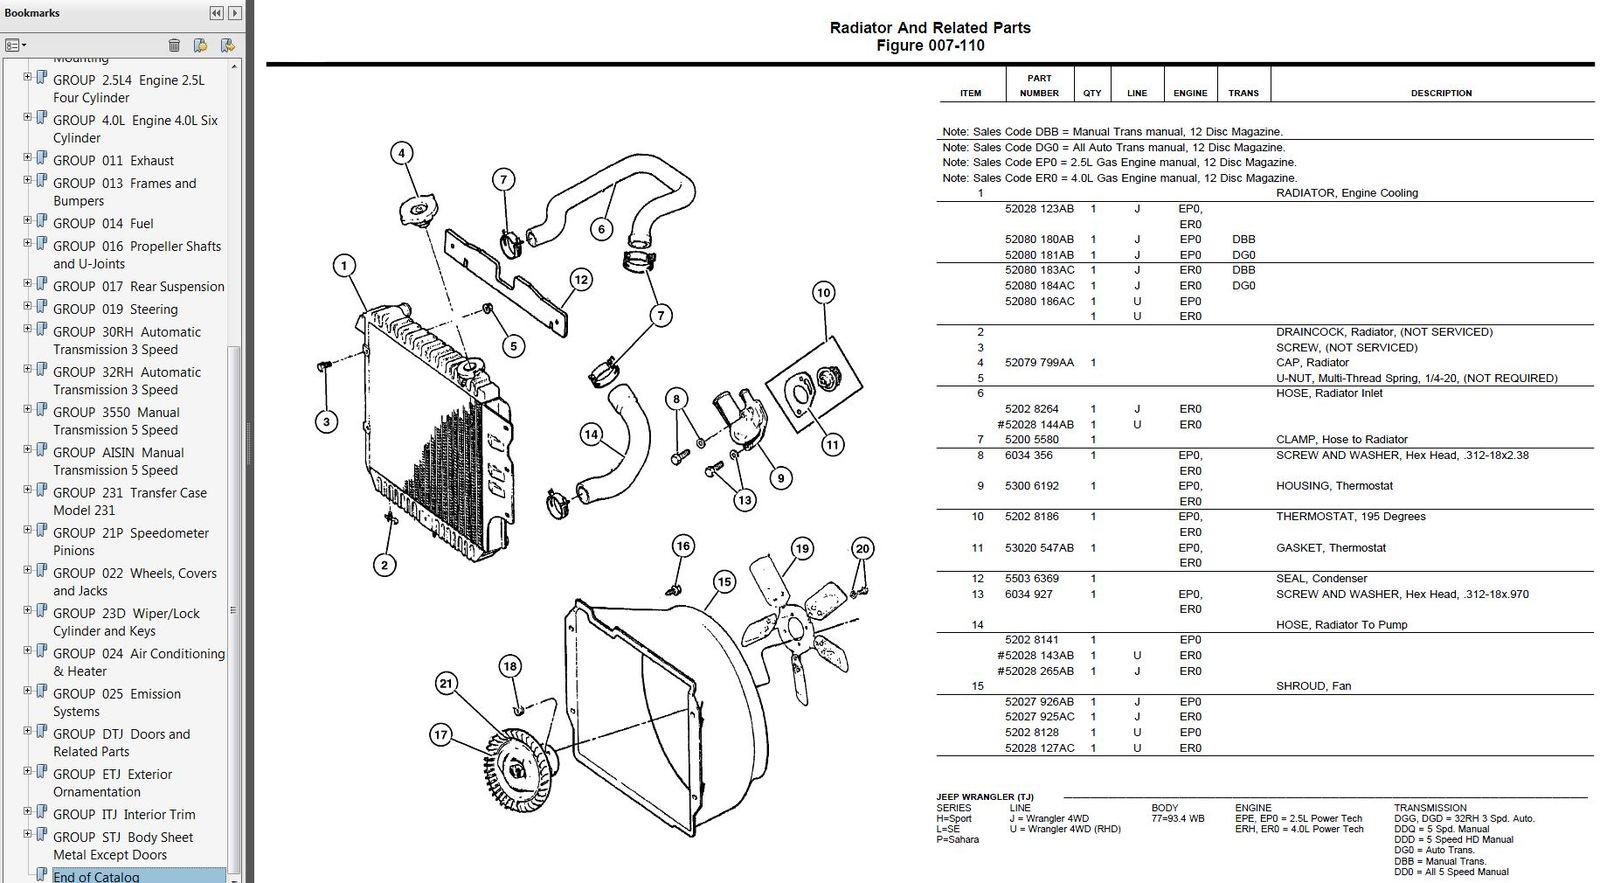 Parts Sample on Jeep Wrangler Oem Parts Diagram Grille